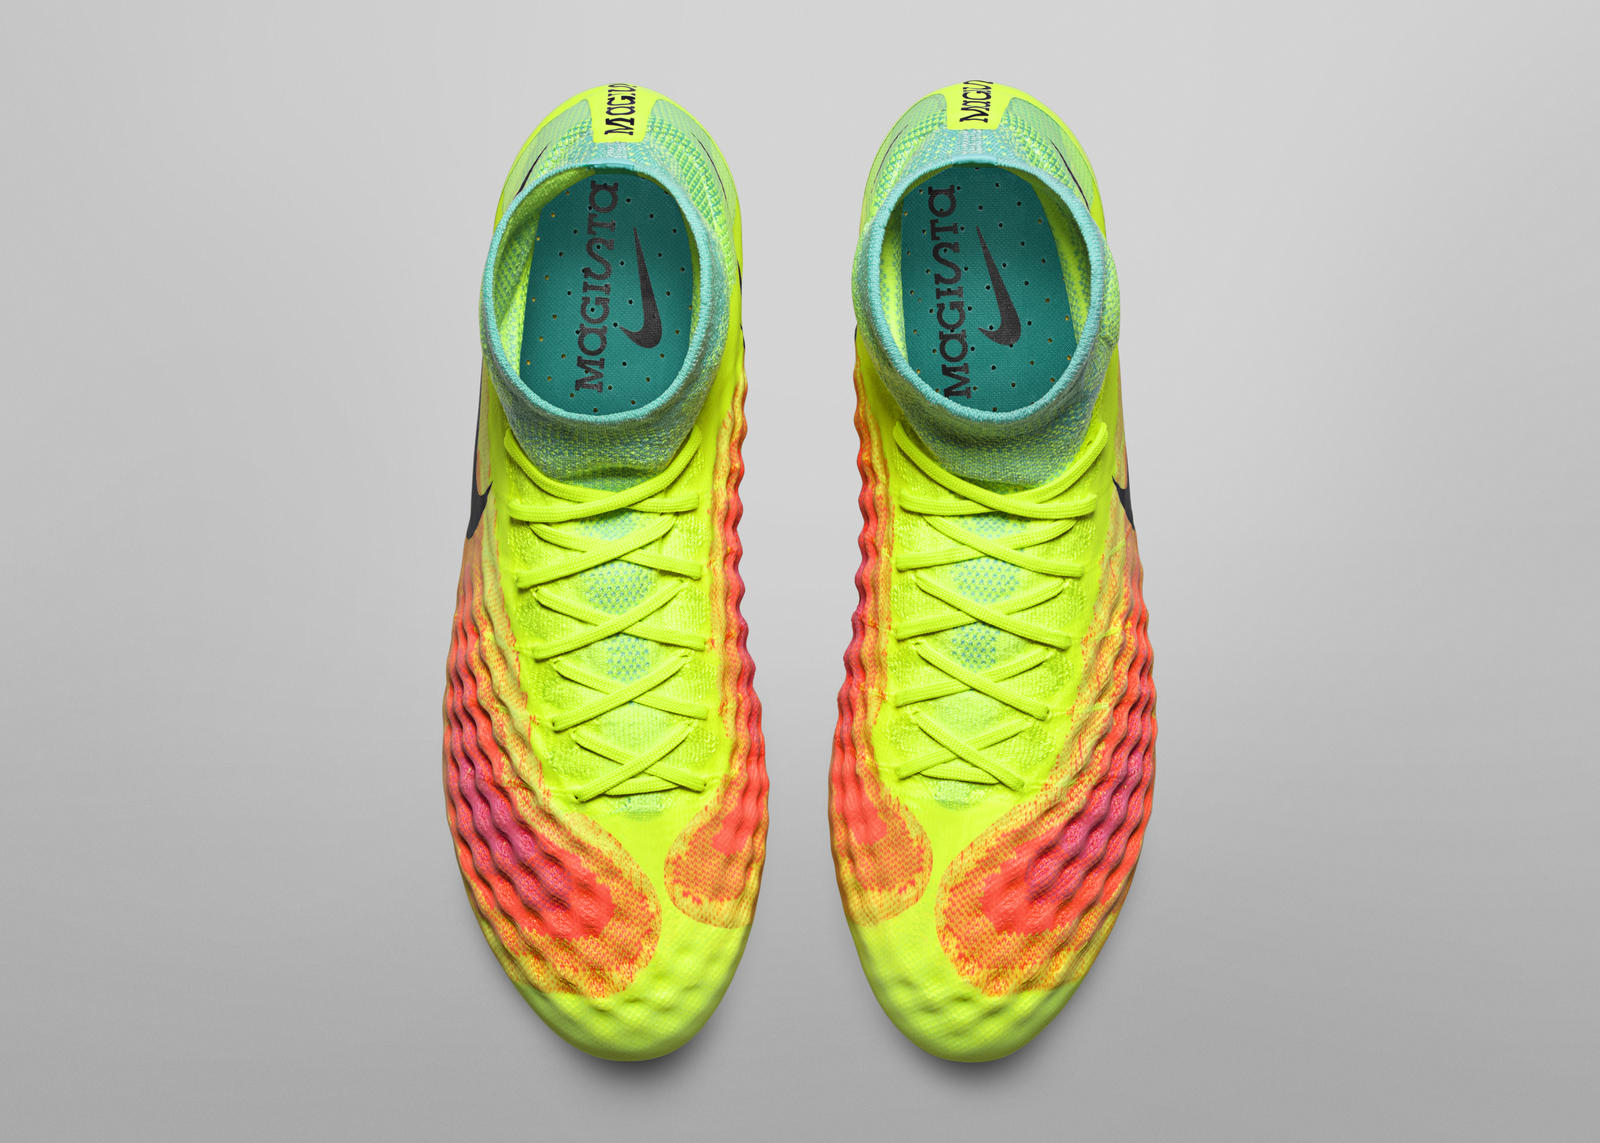 863c3765e4b Magista 2 - Nike News